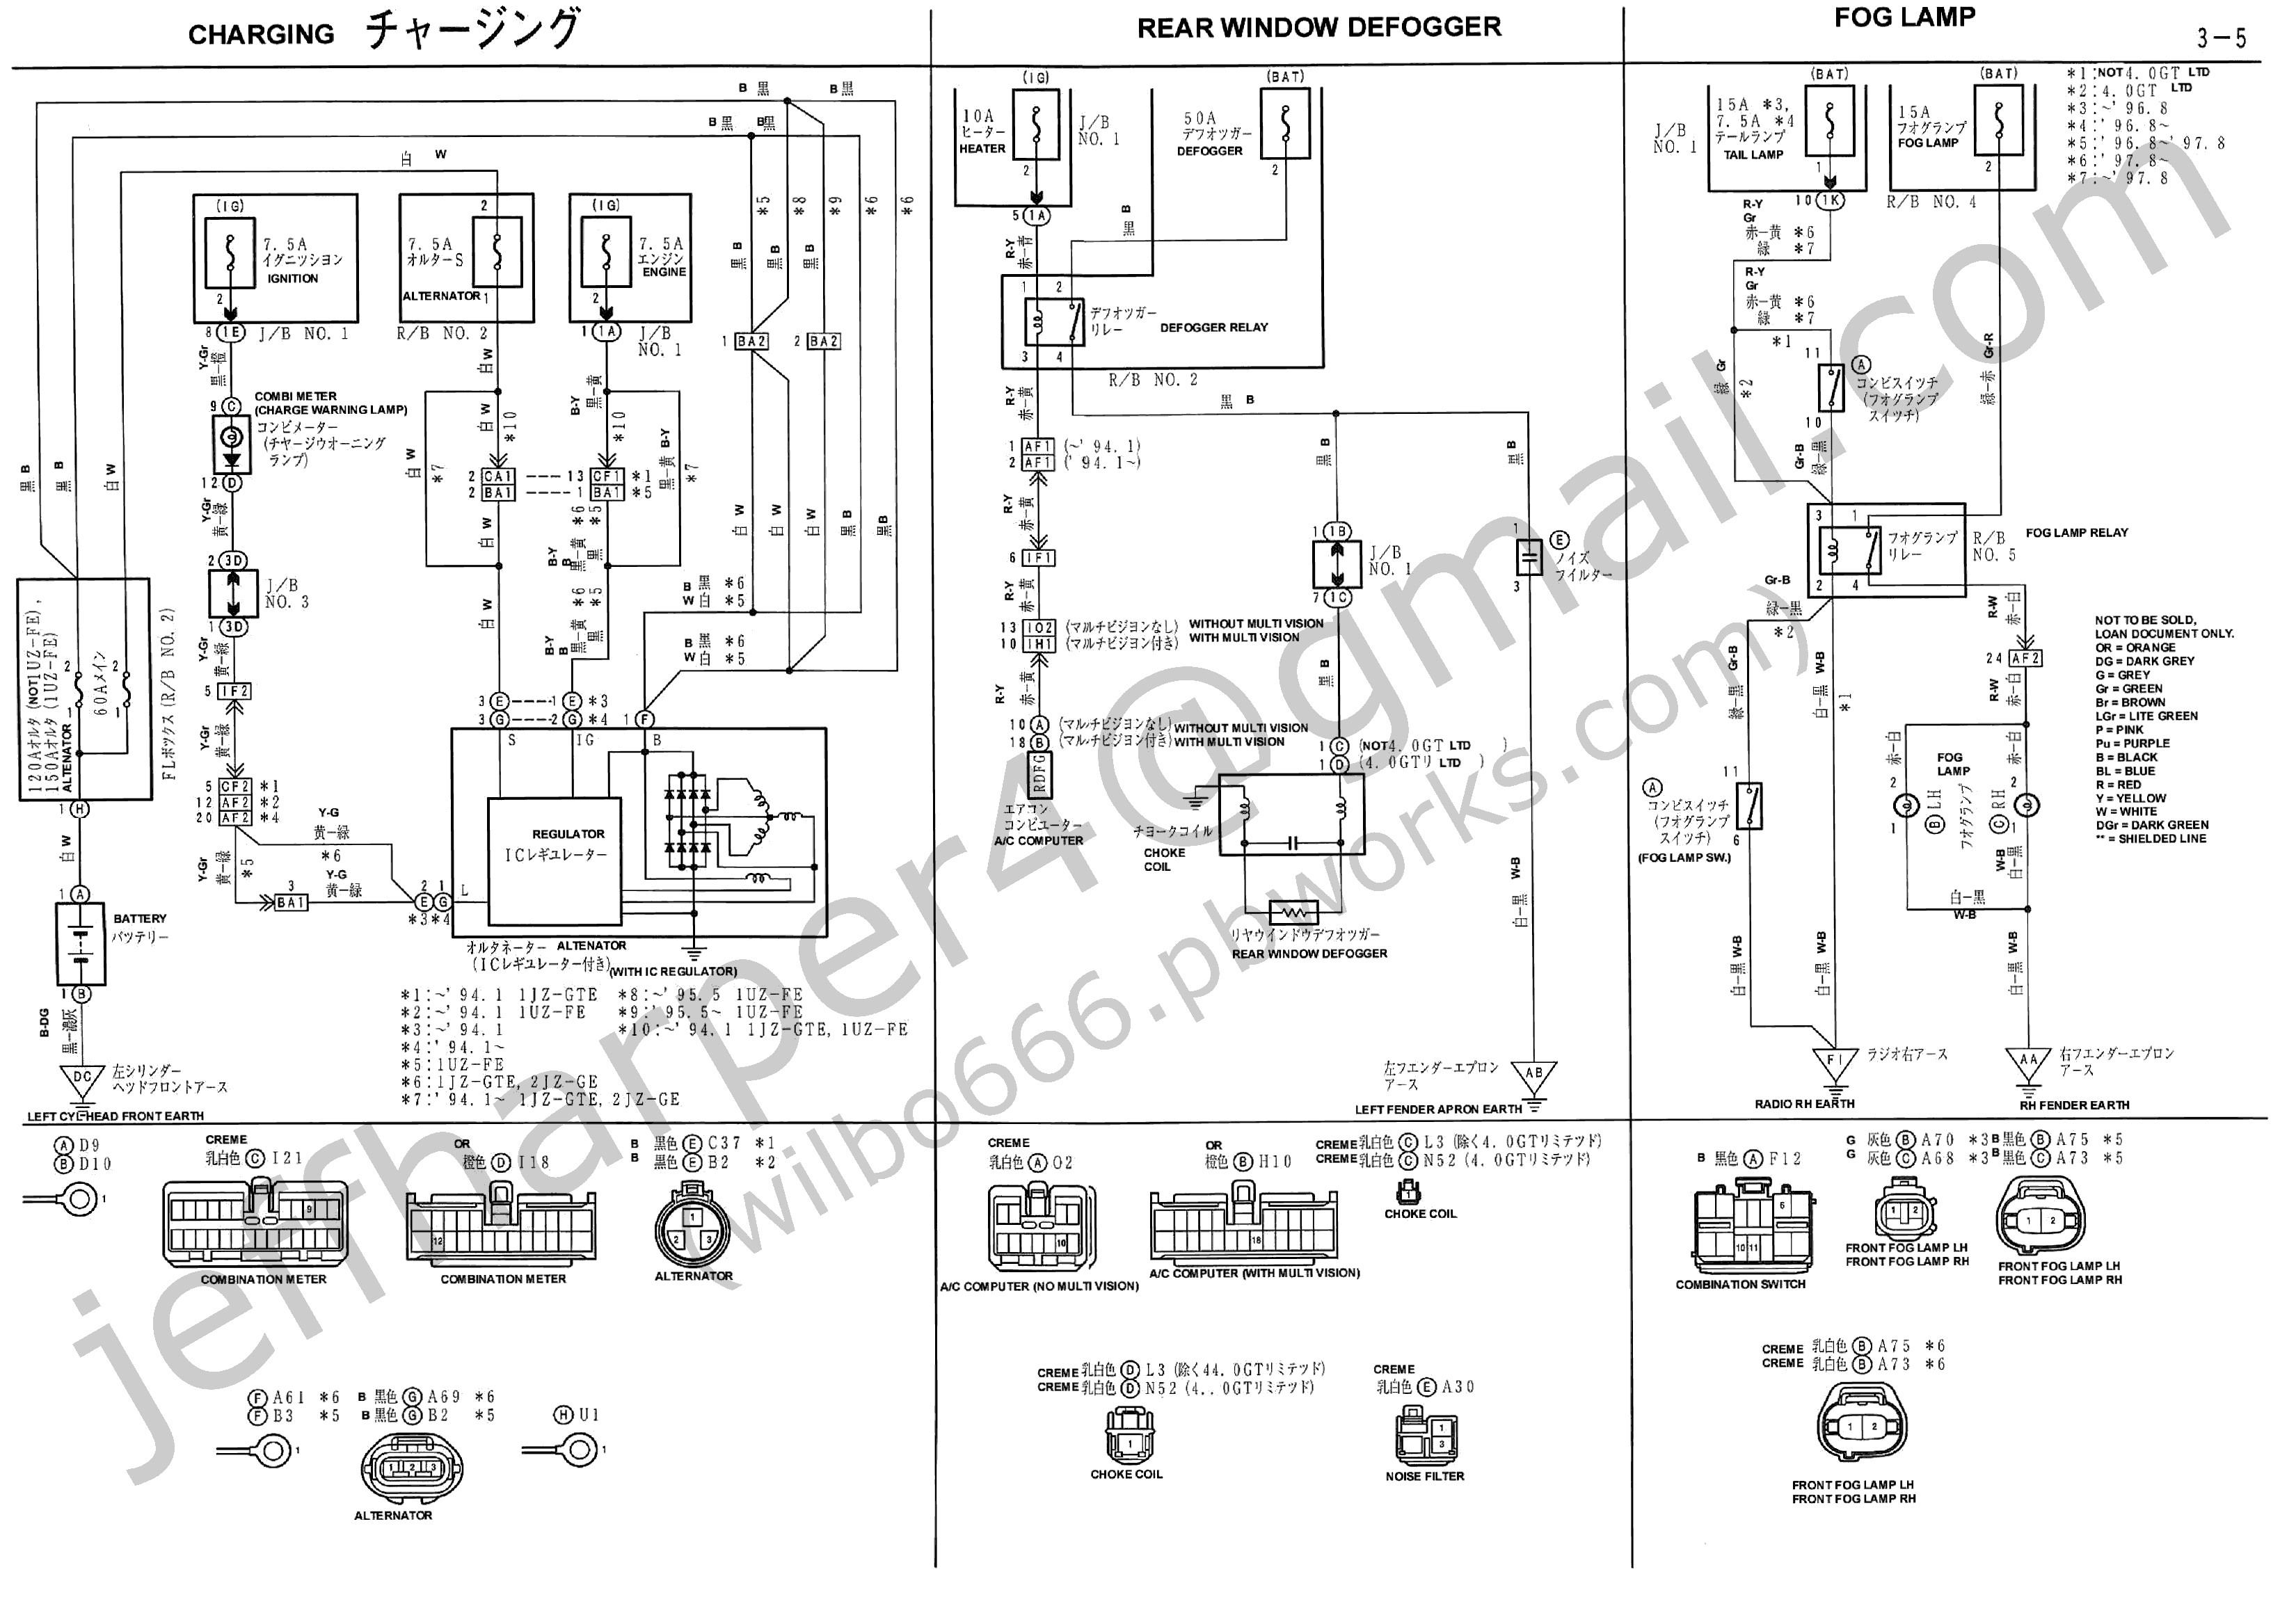 1jz Engine Wiring Diagram Wilbo666 1jz Gte Jzz30 soarer Engine Wiring Of 1jz Engine Wiring Diagram